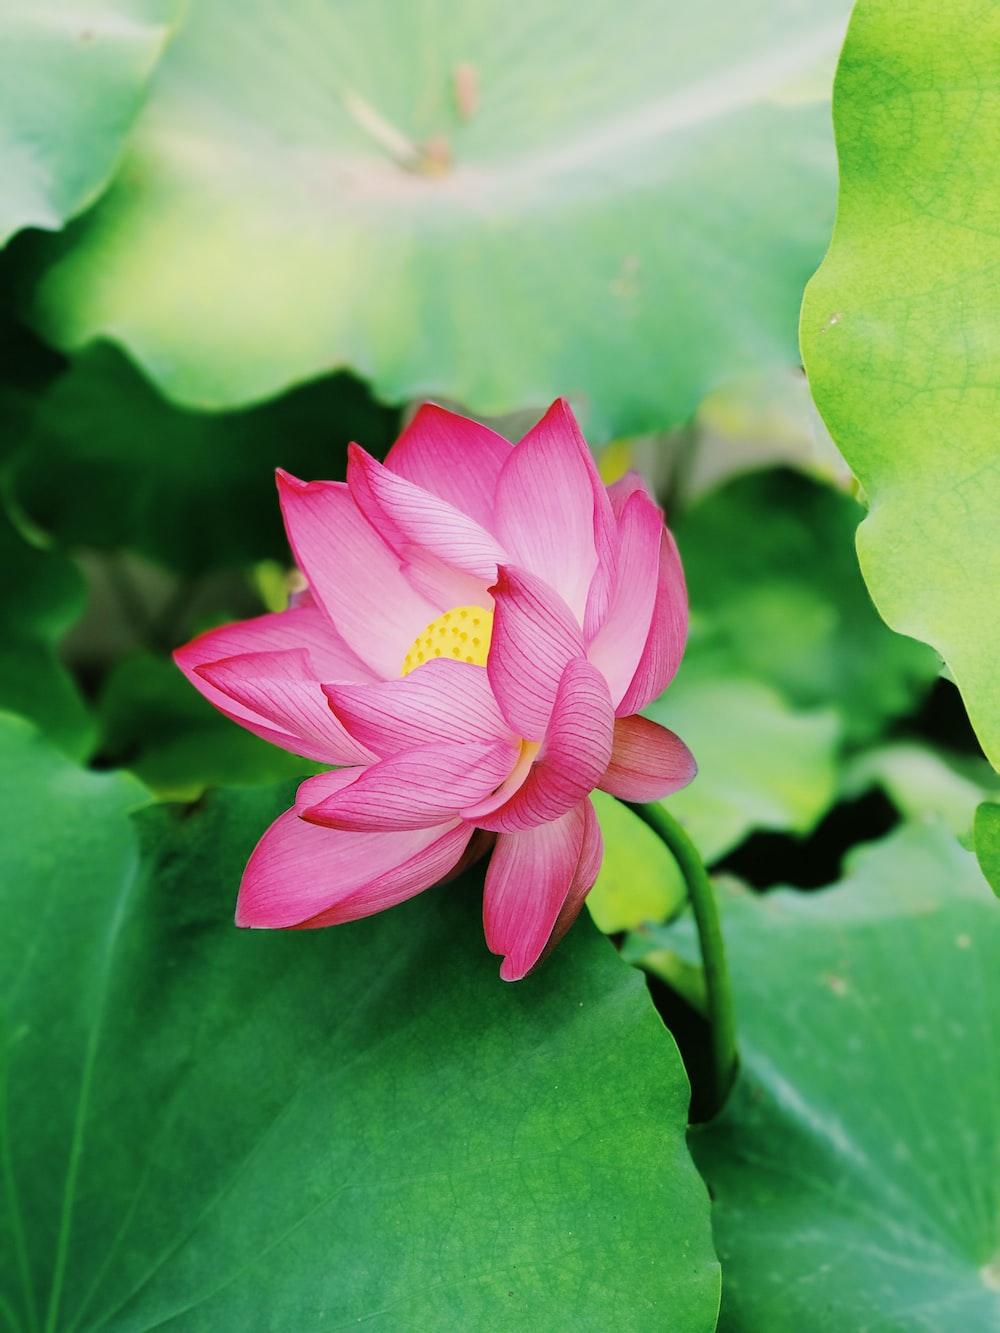 closeup photography of pink lotus flower